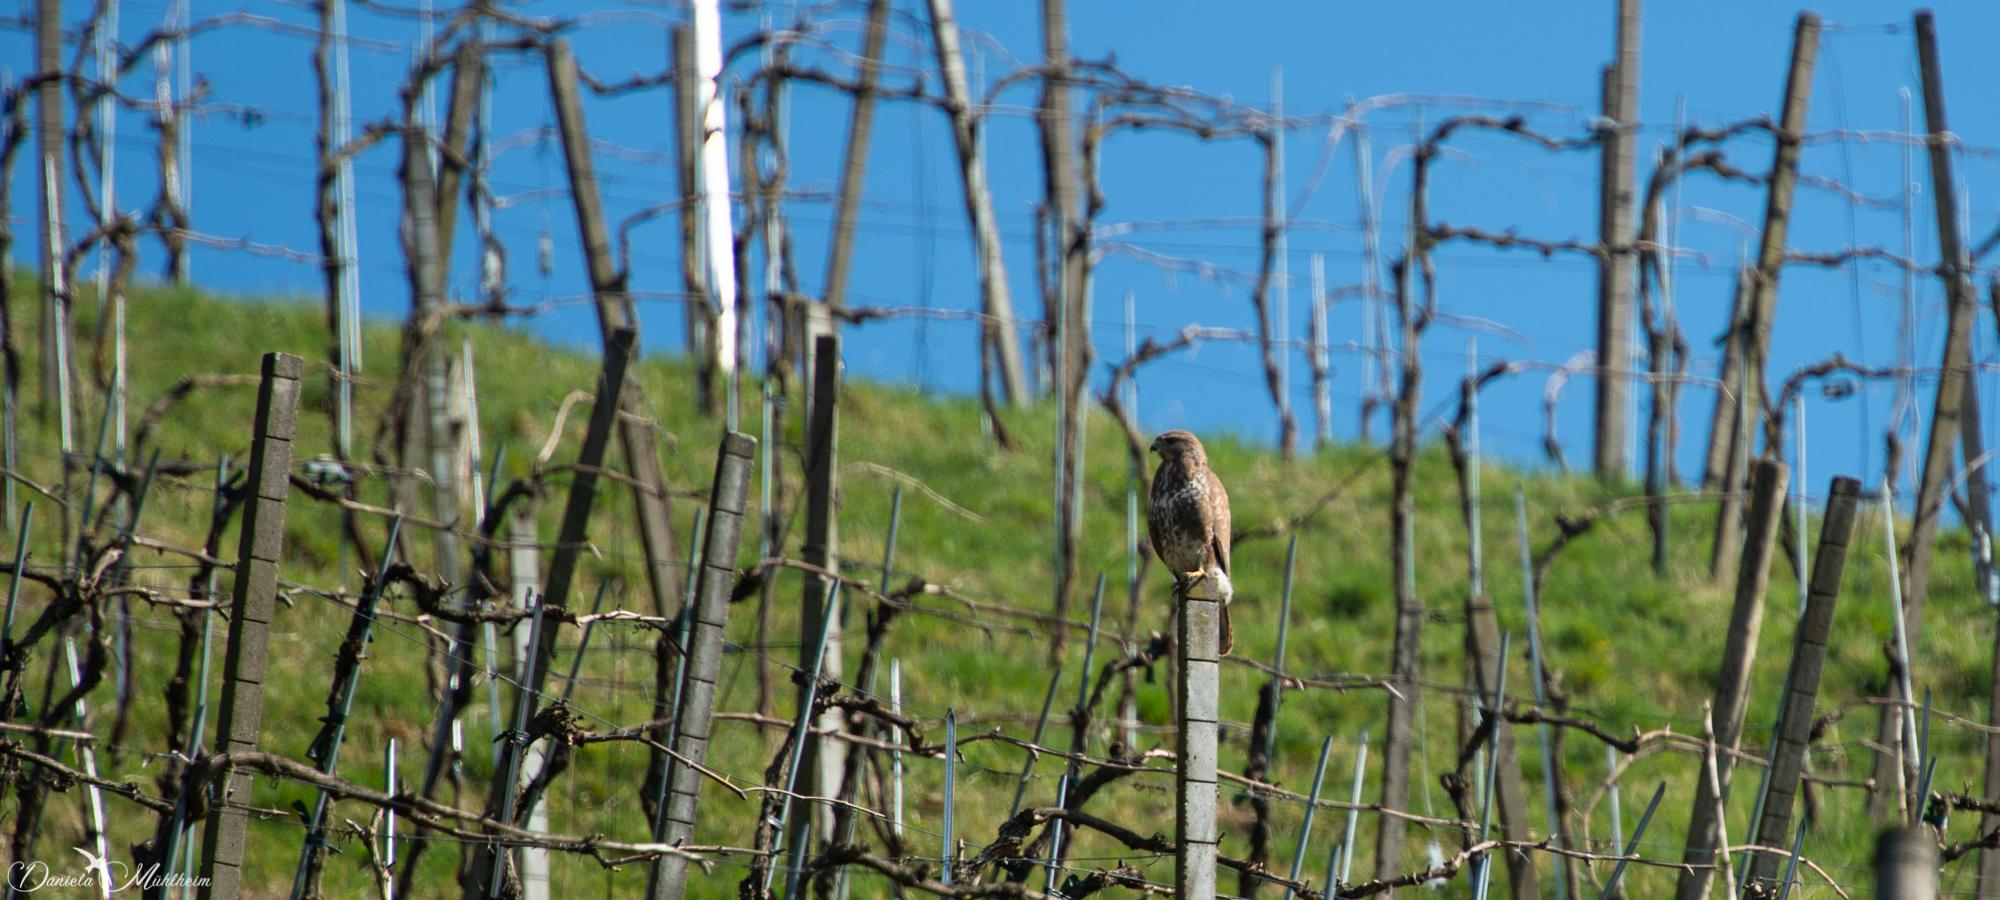 daniela, danielamuehlheim, mühlheim, ladybird, exploring, earth, abundance, nature, switzerland, grapevines, bird